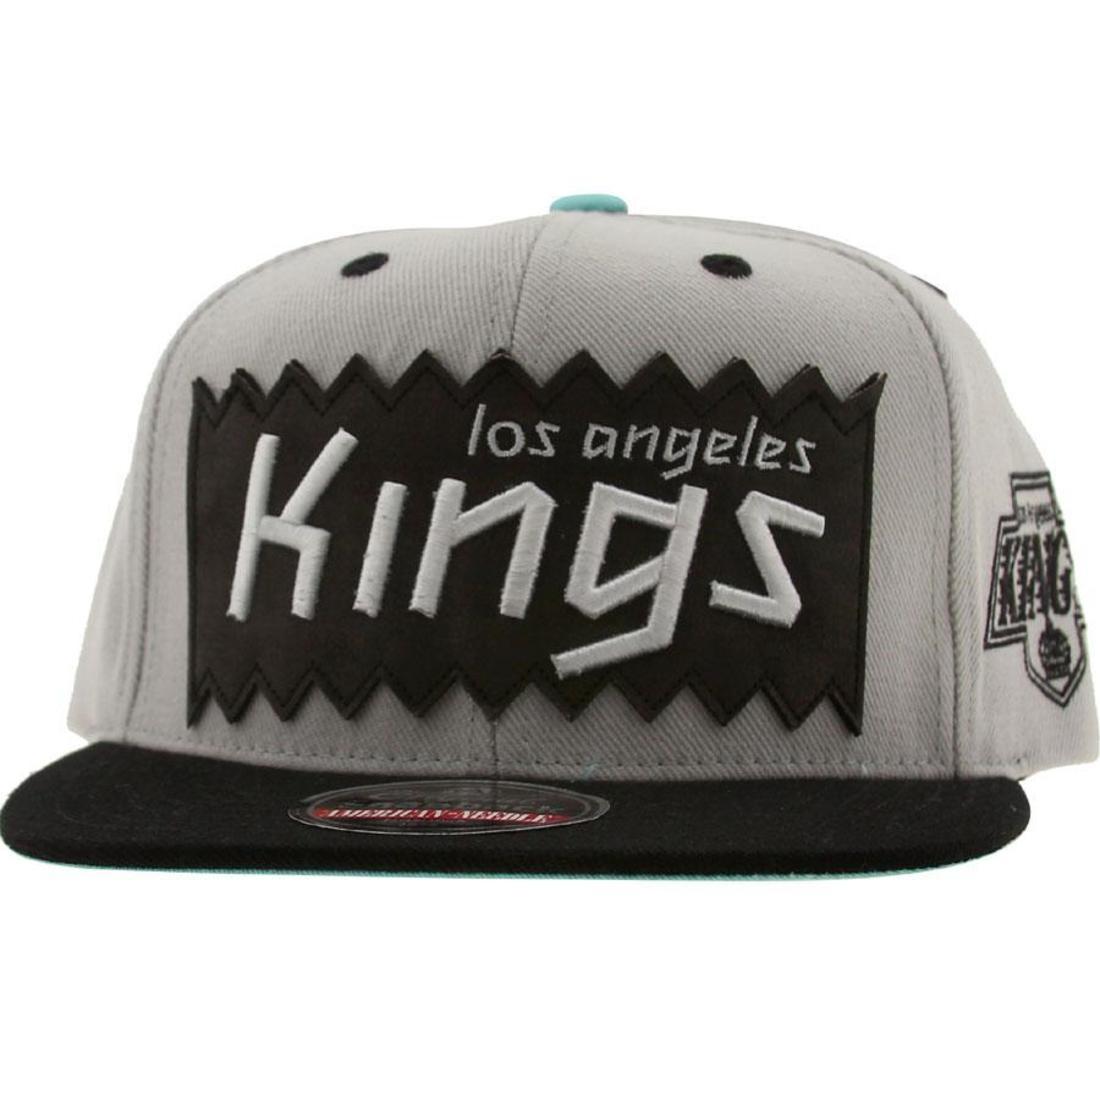 BAIT x NHL x American Needle Los Angeles Kings NHL Retro Snapback Cap (silver / black)